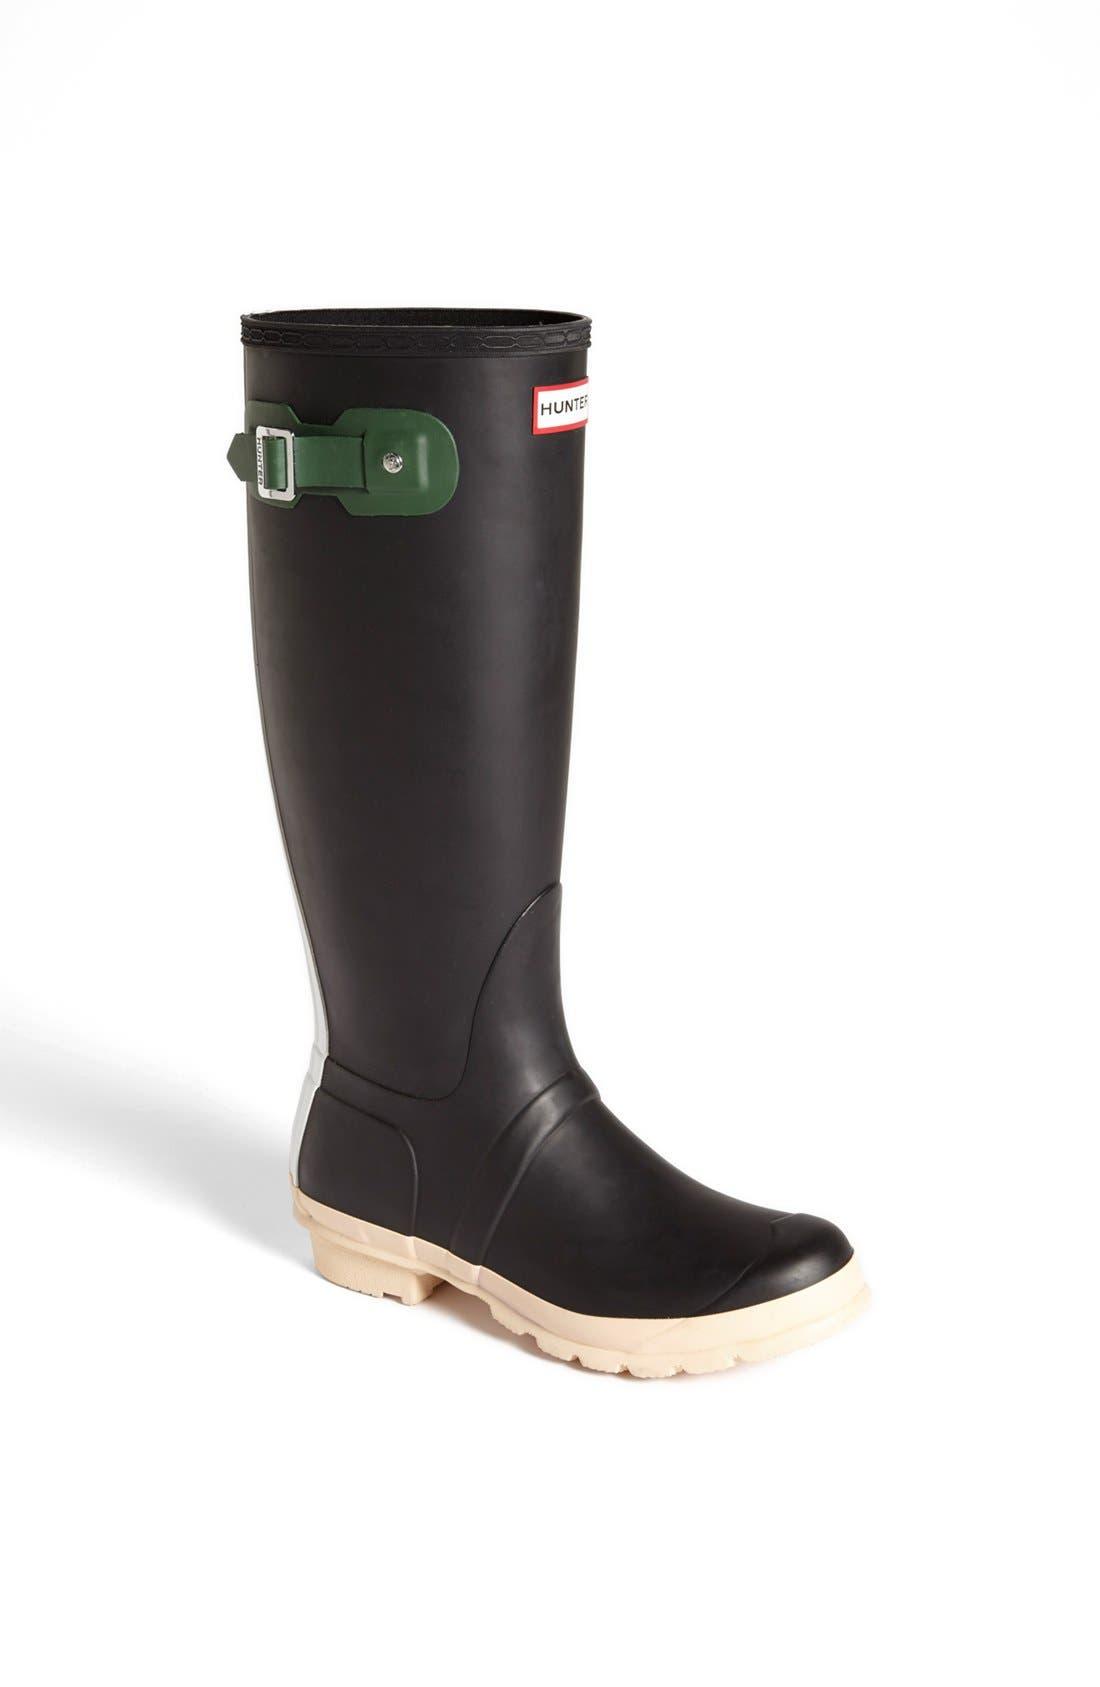 Main Image - Hunter 'Original - Contrast' Waterproof Rain Boot (Women)